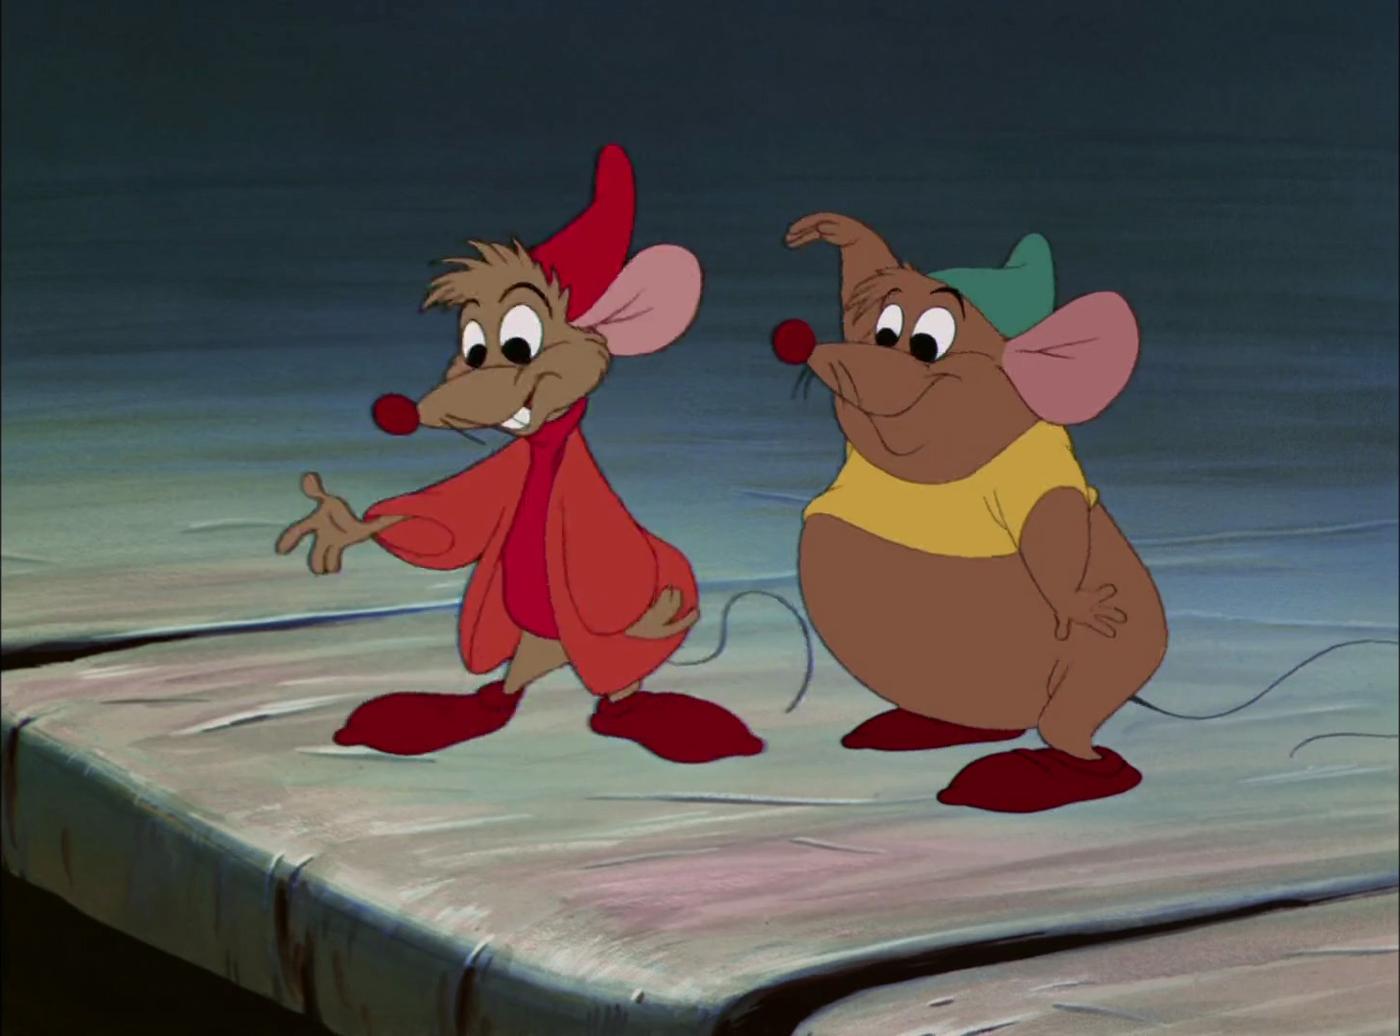 Výsledek obrázku pro cinderella and mouse